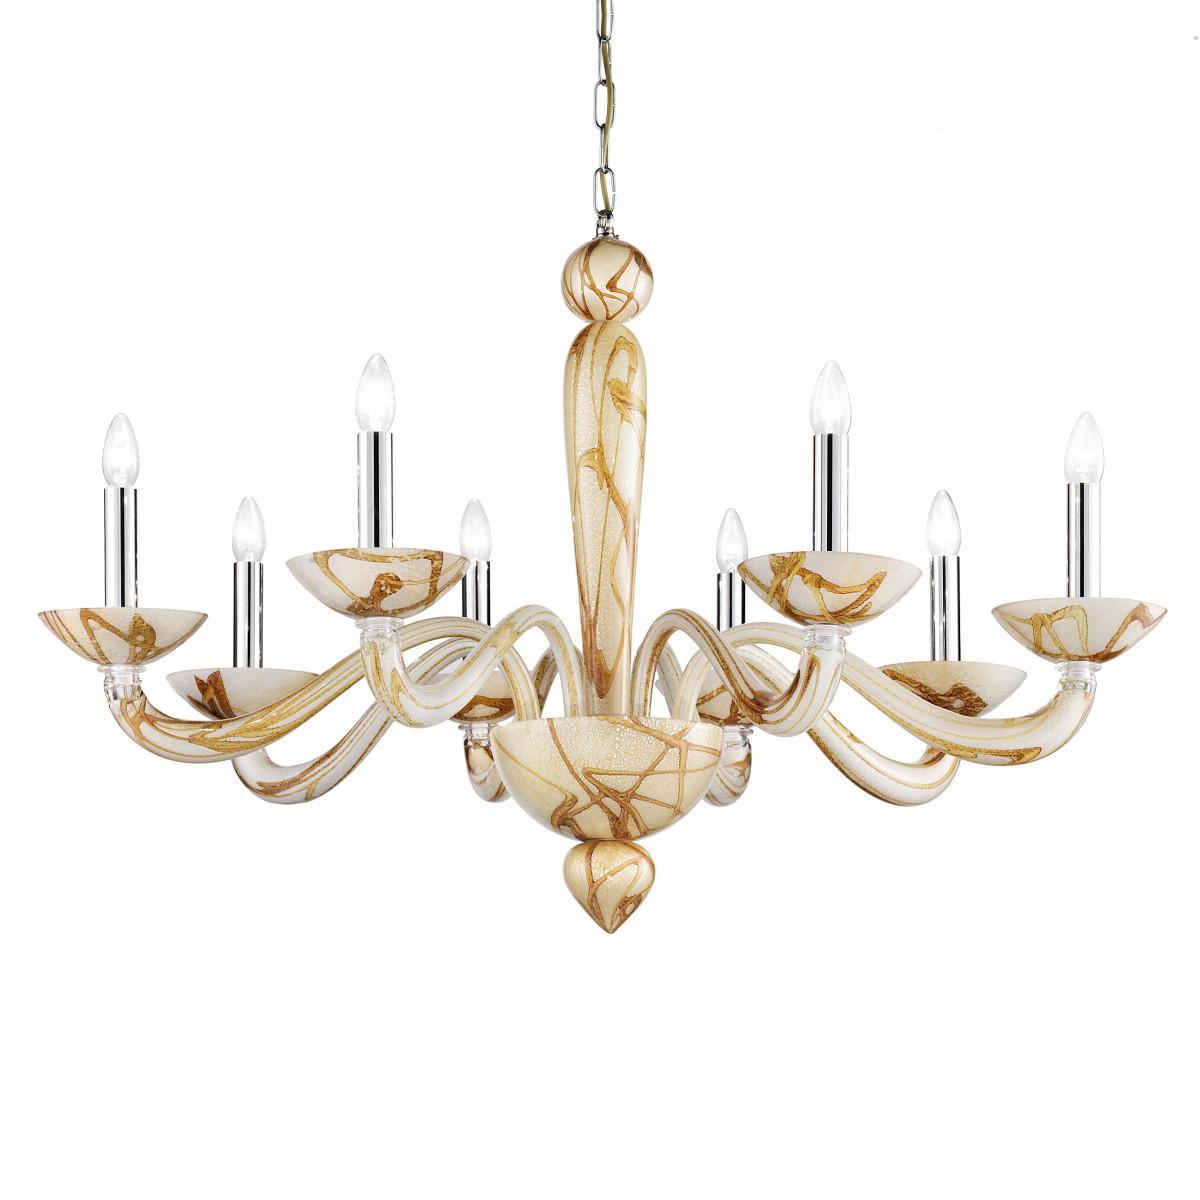 Semplice lampara de cristal de Murano 8 luces - color bambú